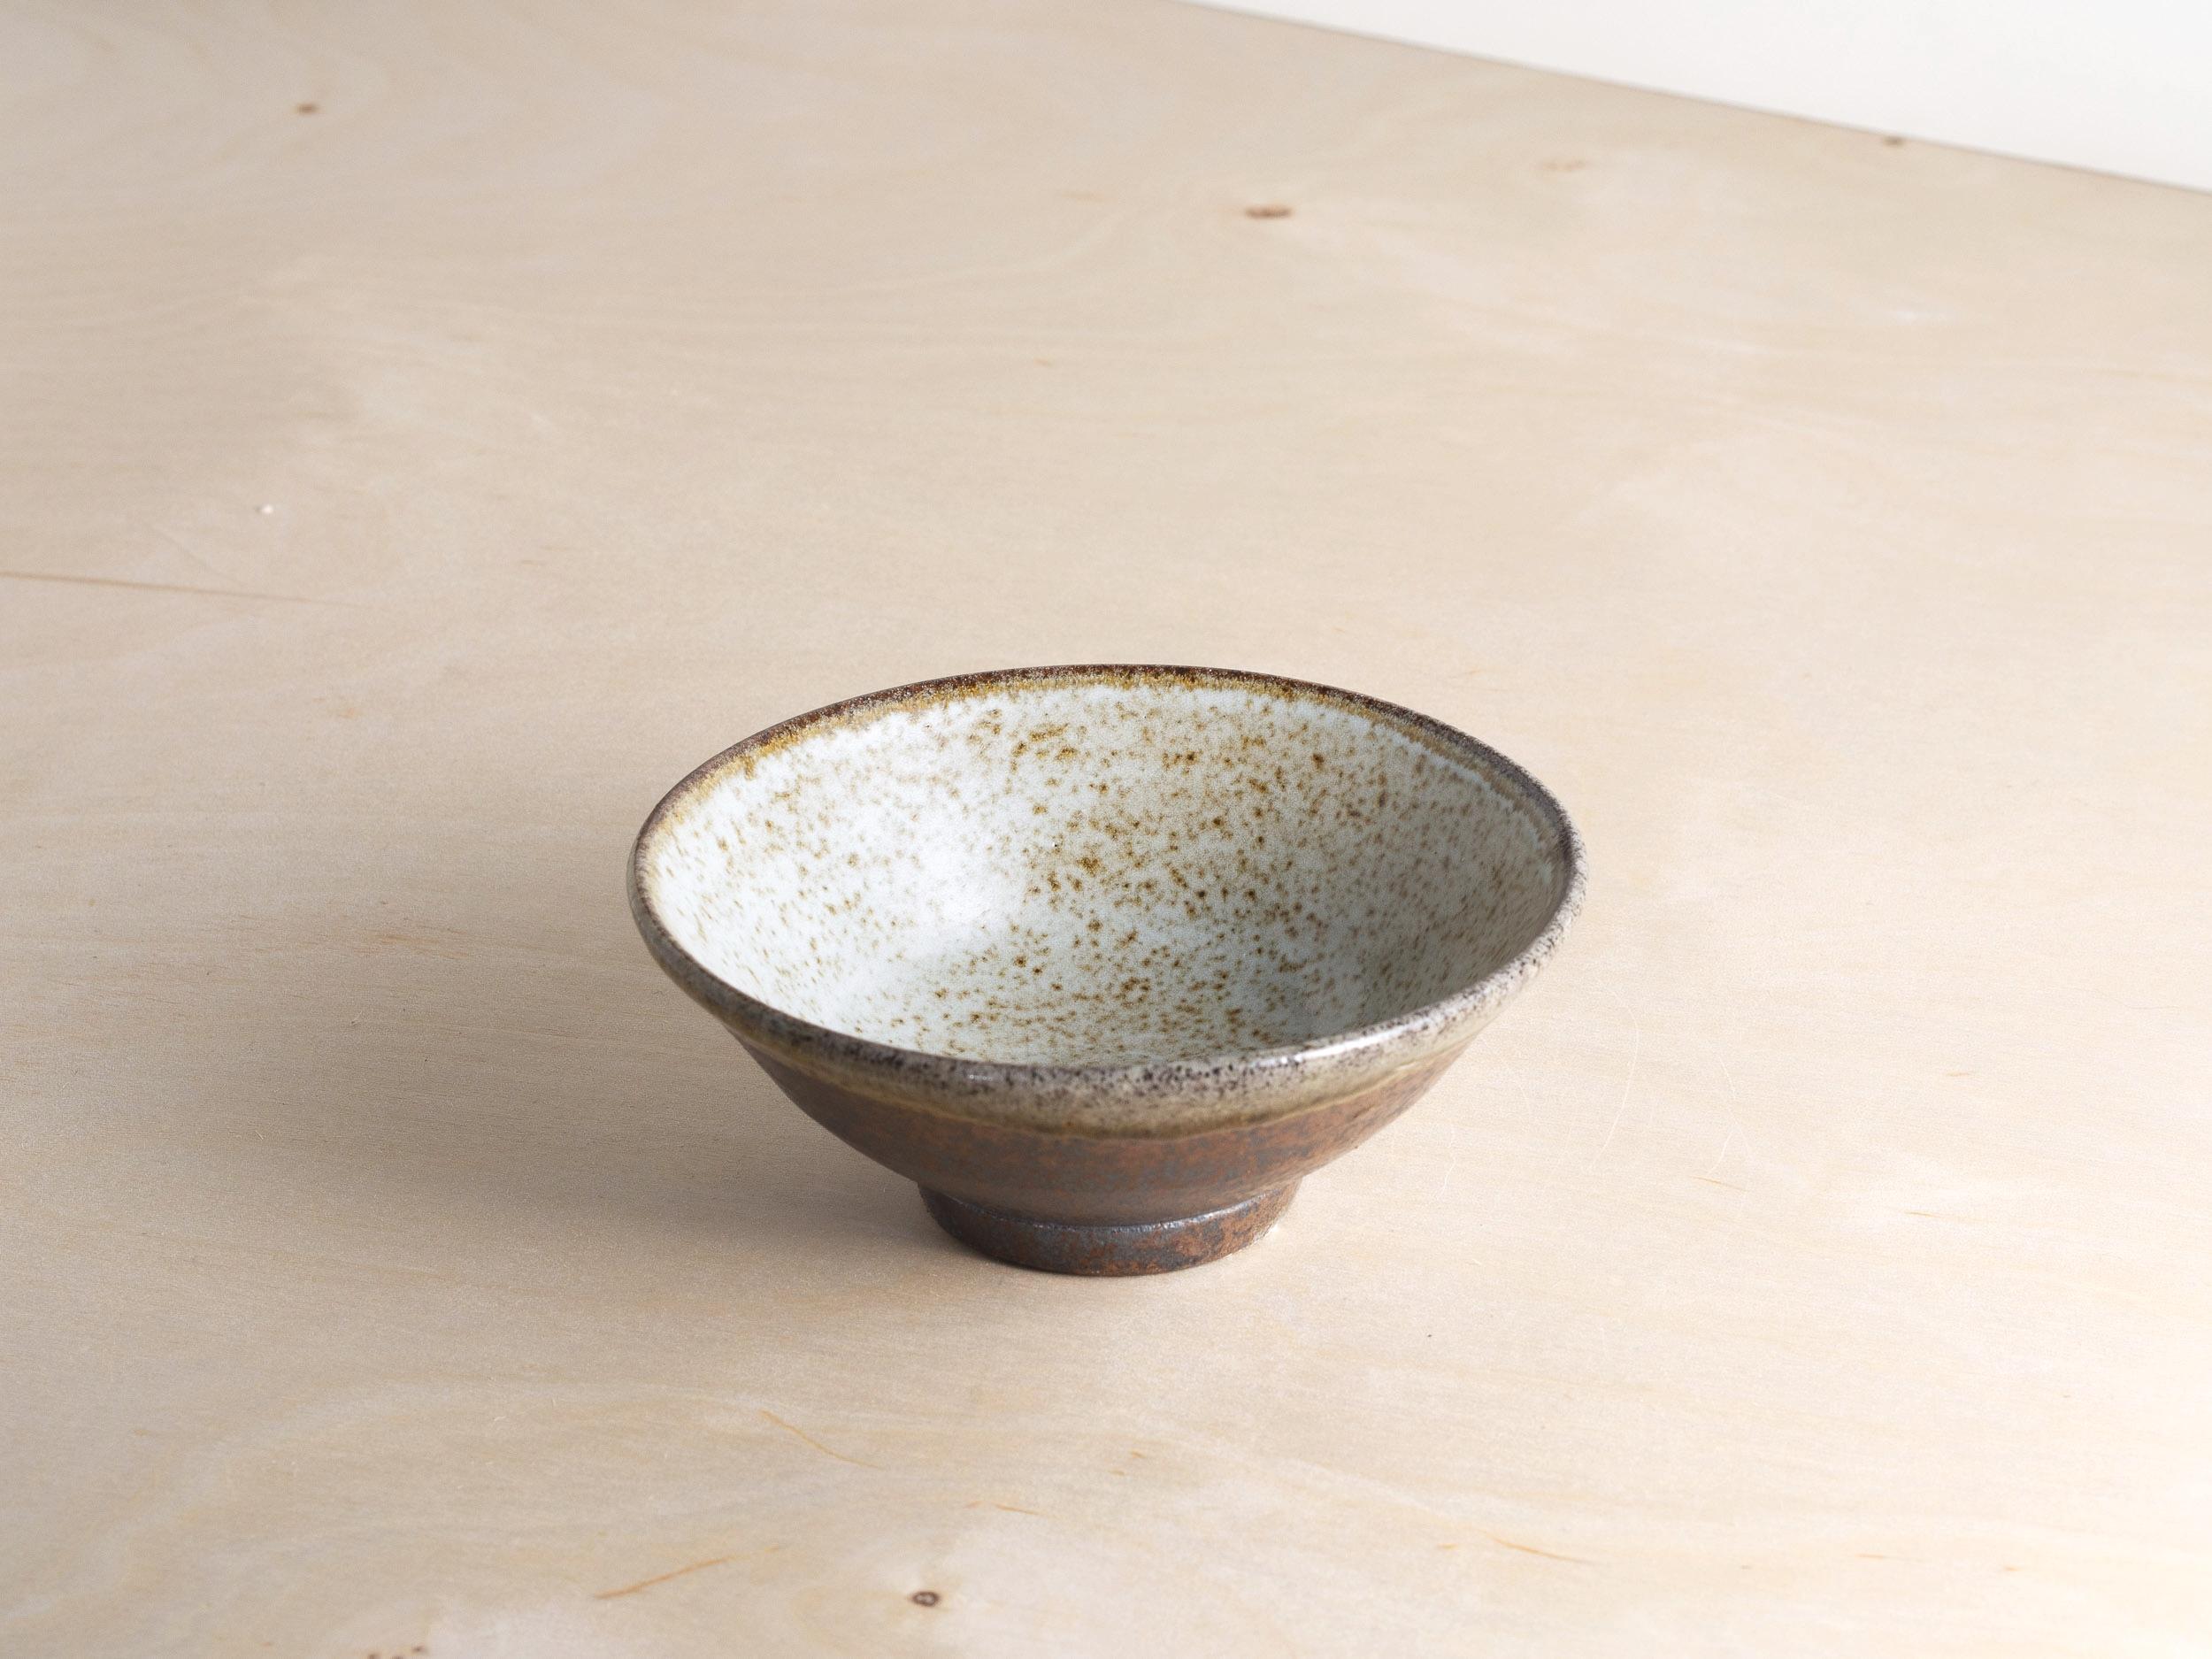 Soda-fired rice bowl